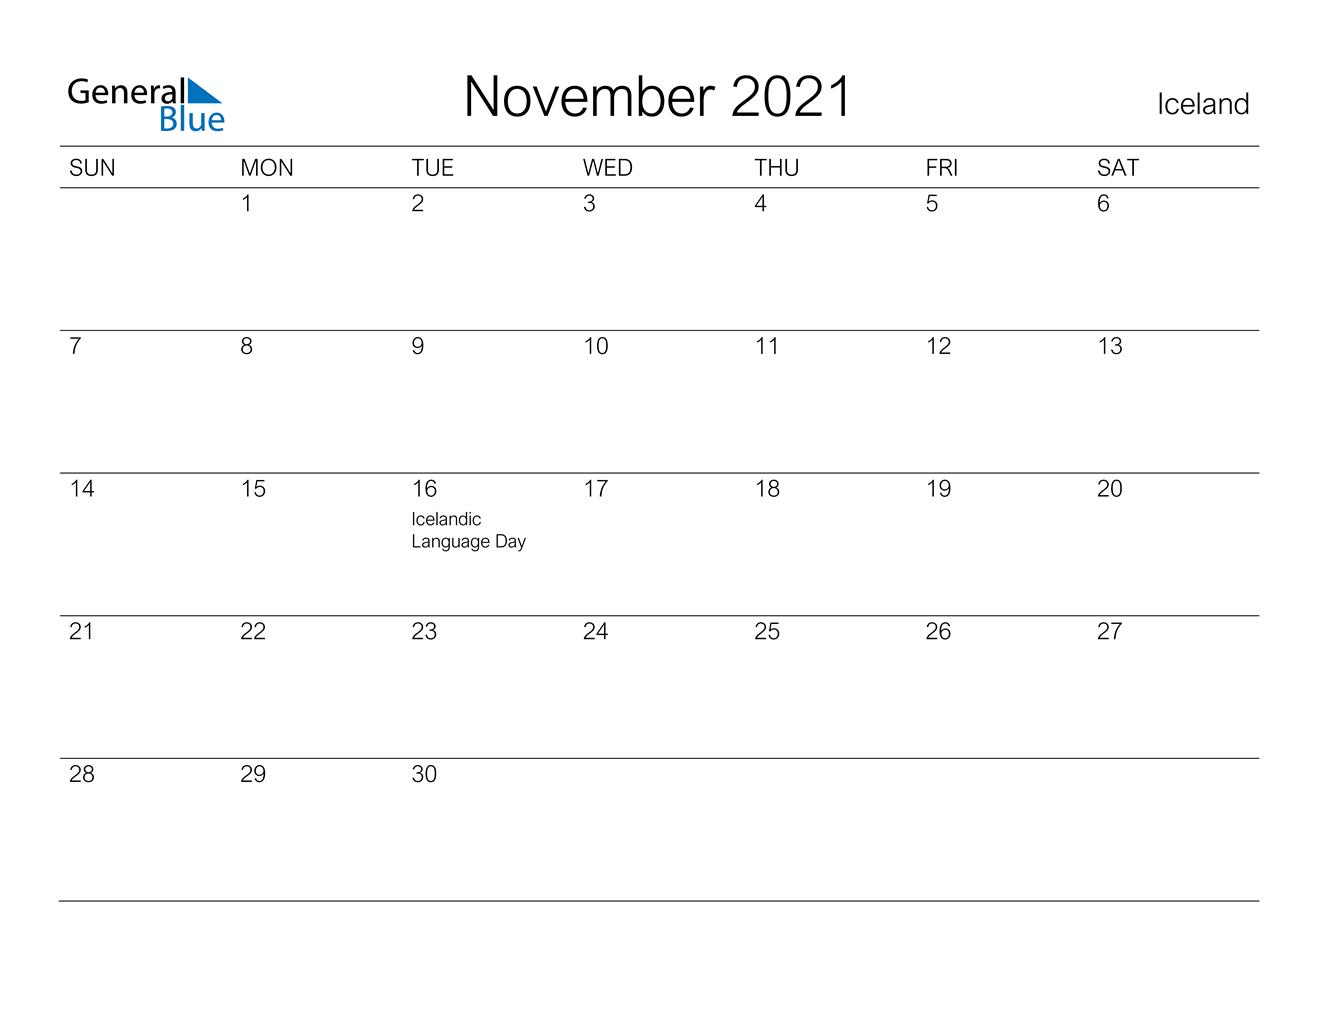 November 2021 Calendar - Iceland